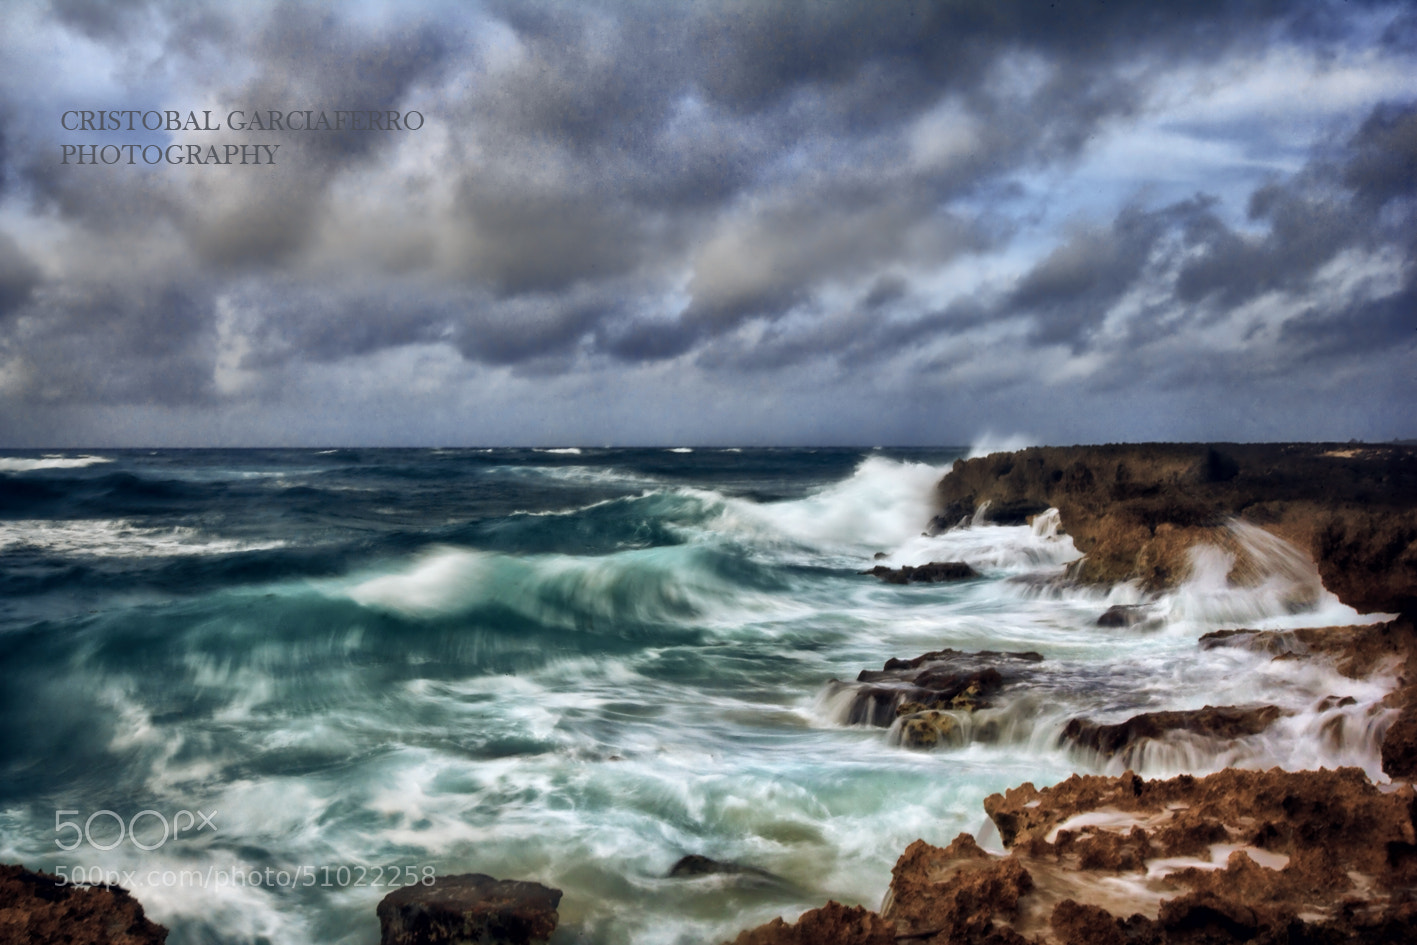 Photograph Cozumel beach by Cristobal Garciaferro Rubio on 500px